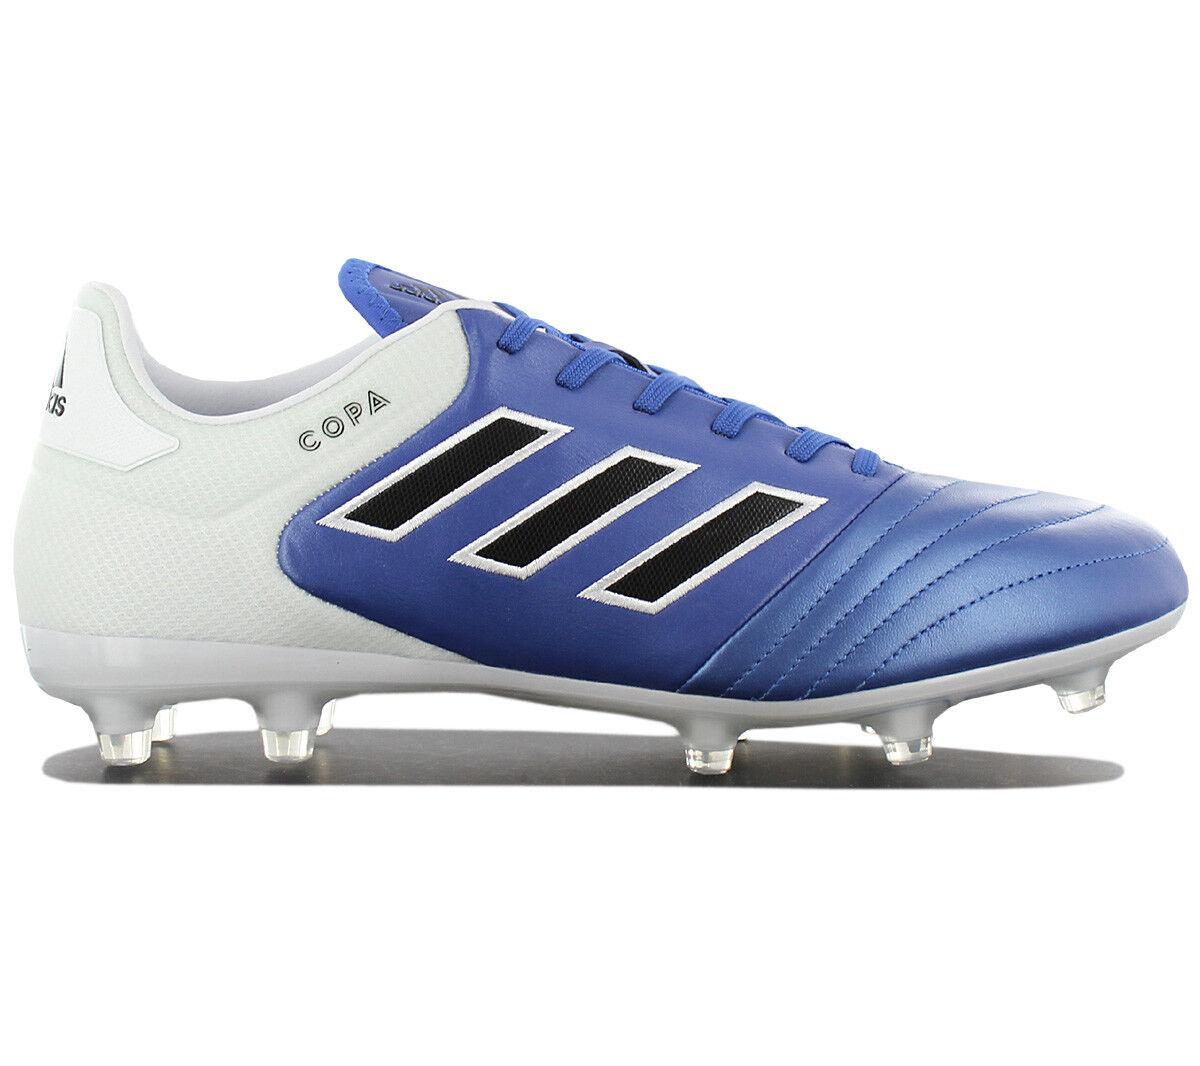 Adidas Copa 17.2 FG Herren Nocken Fußballschuhe Leder Leder Leder Blau Mundial BA8521 NEU 38c107